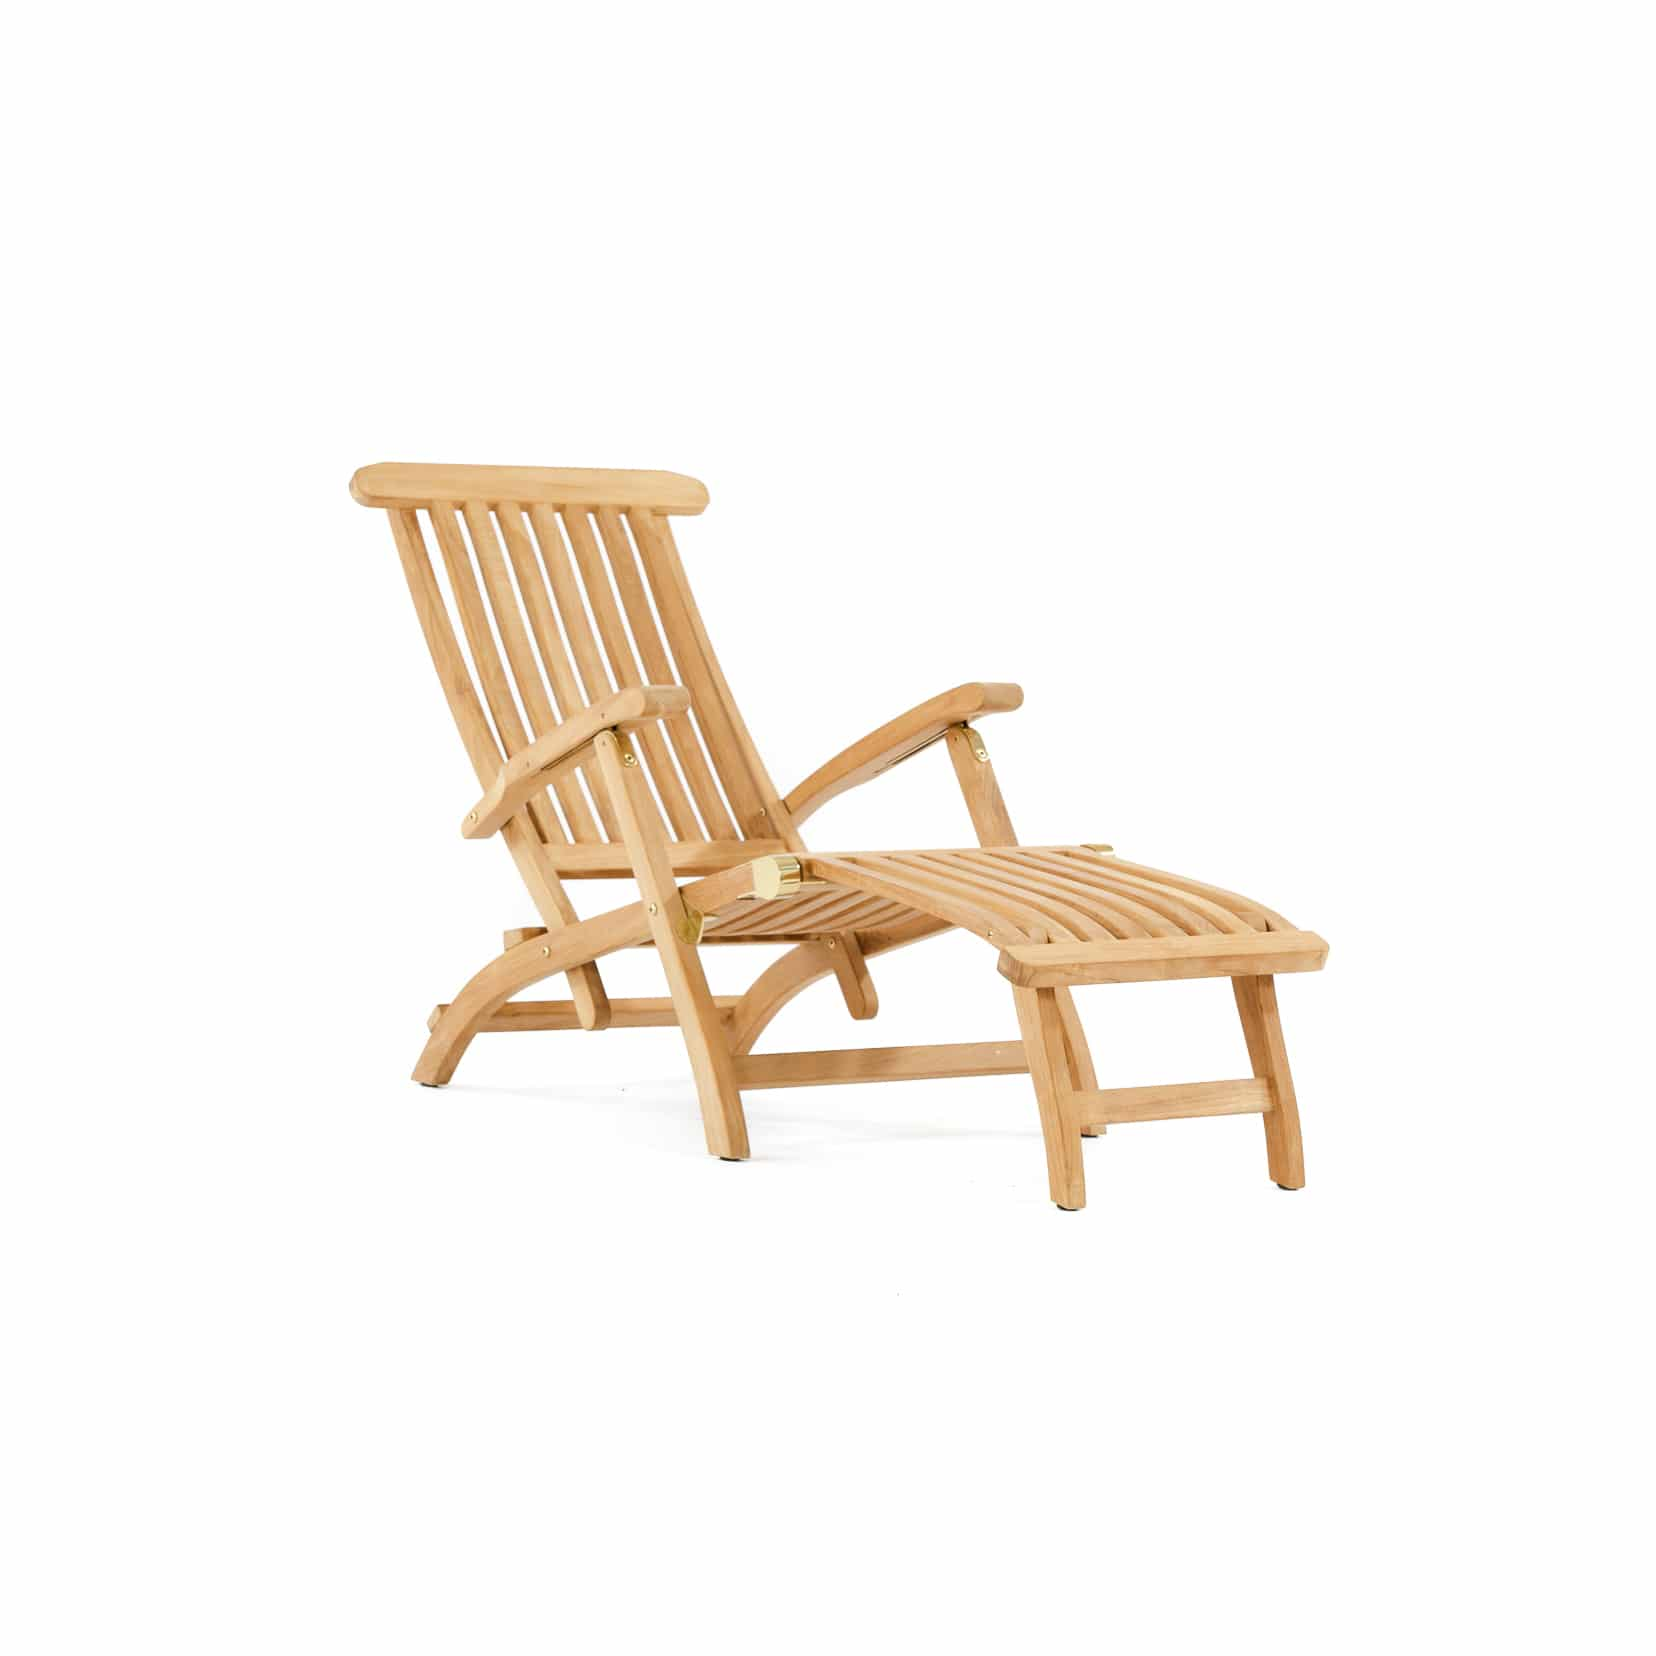 Teak Garden Lounger Lg02 Indonesia Outdoor Furniture